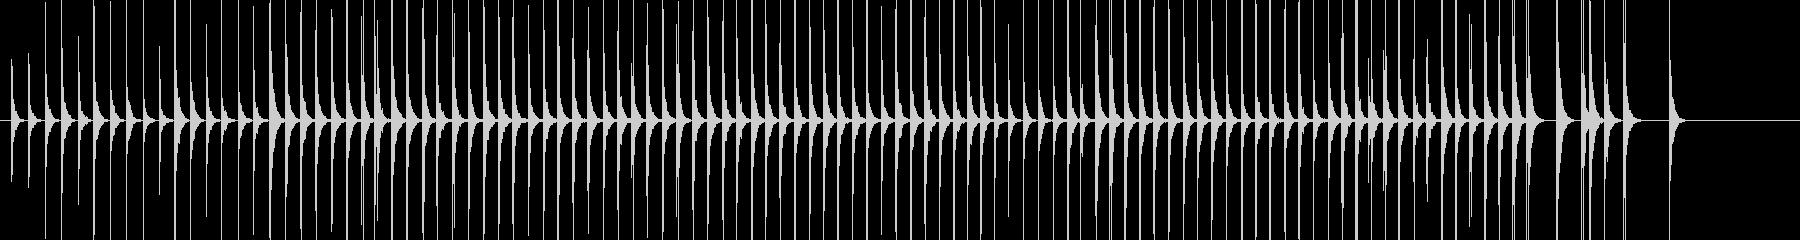 木琴1歌舞伎黒御簾下座音楽和風日本マリンの未再生の波形